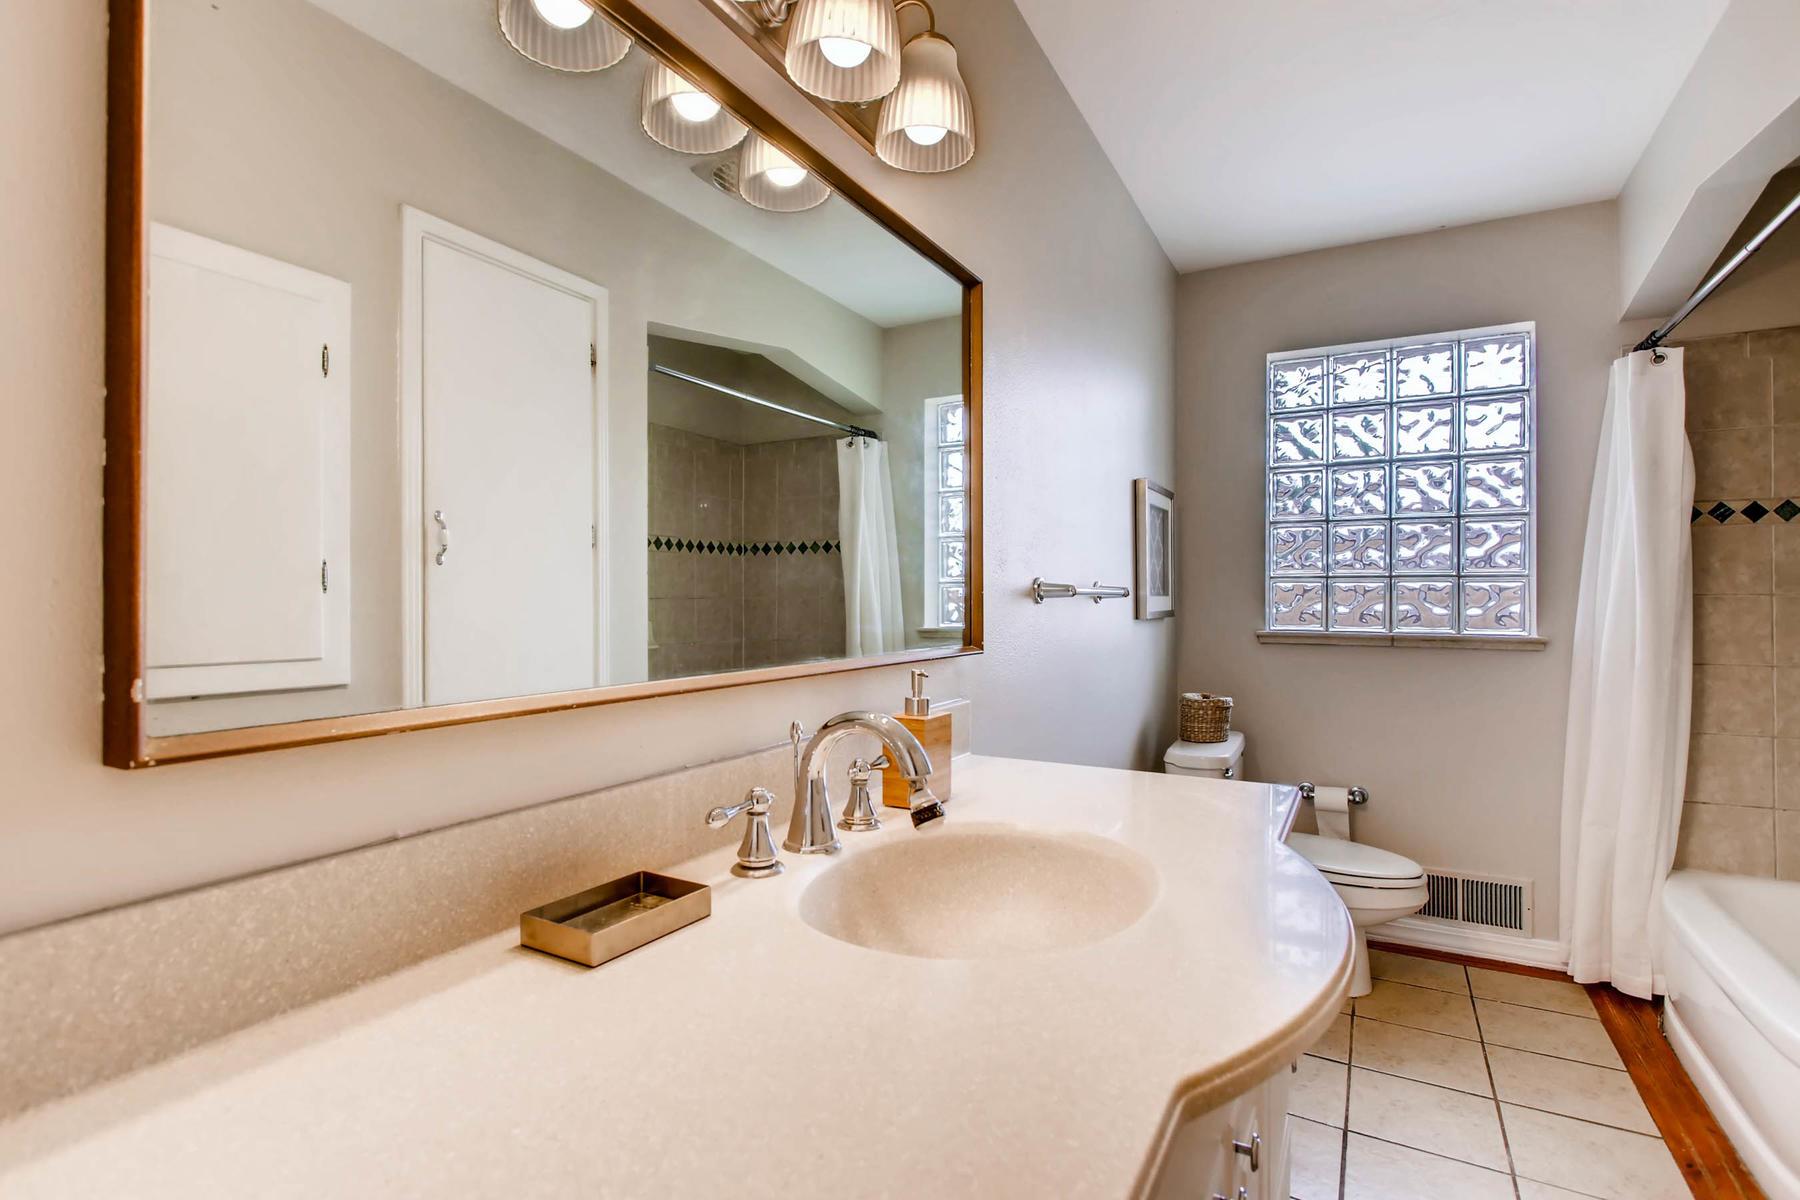 5091 S CLARKSON STREET-MLS_Size-008-6-Master Bathroom-1800x1200-72dpi.jpg